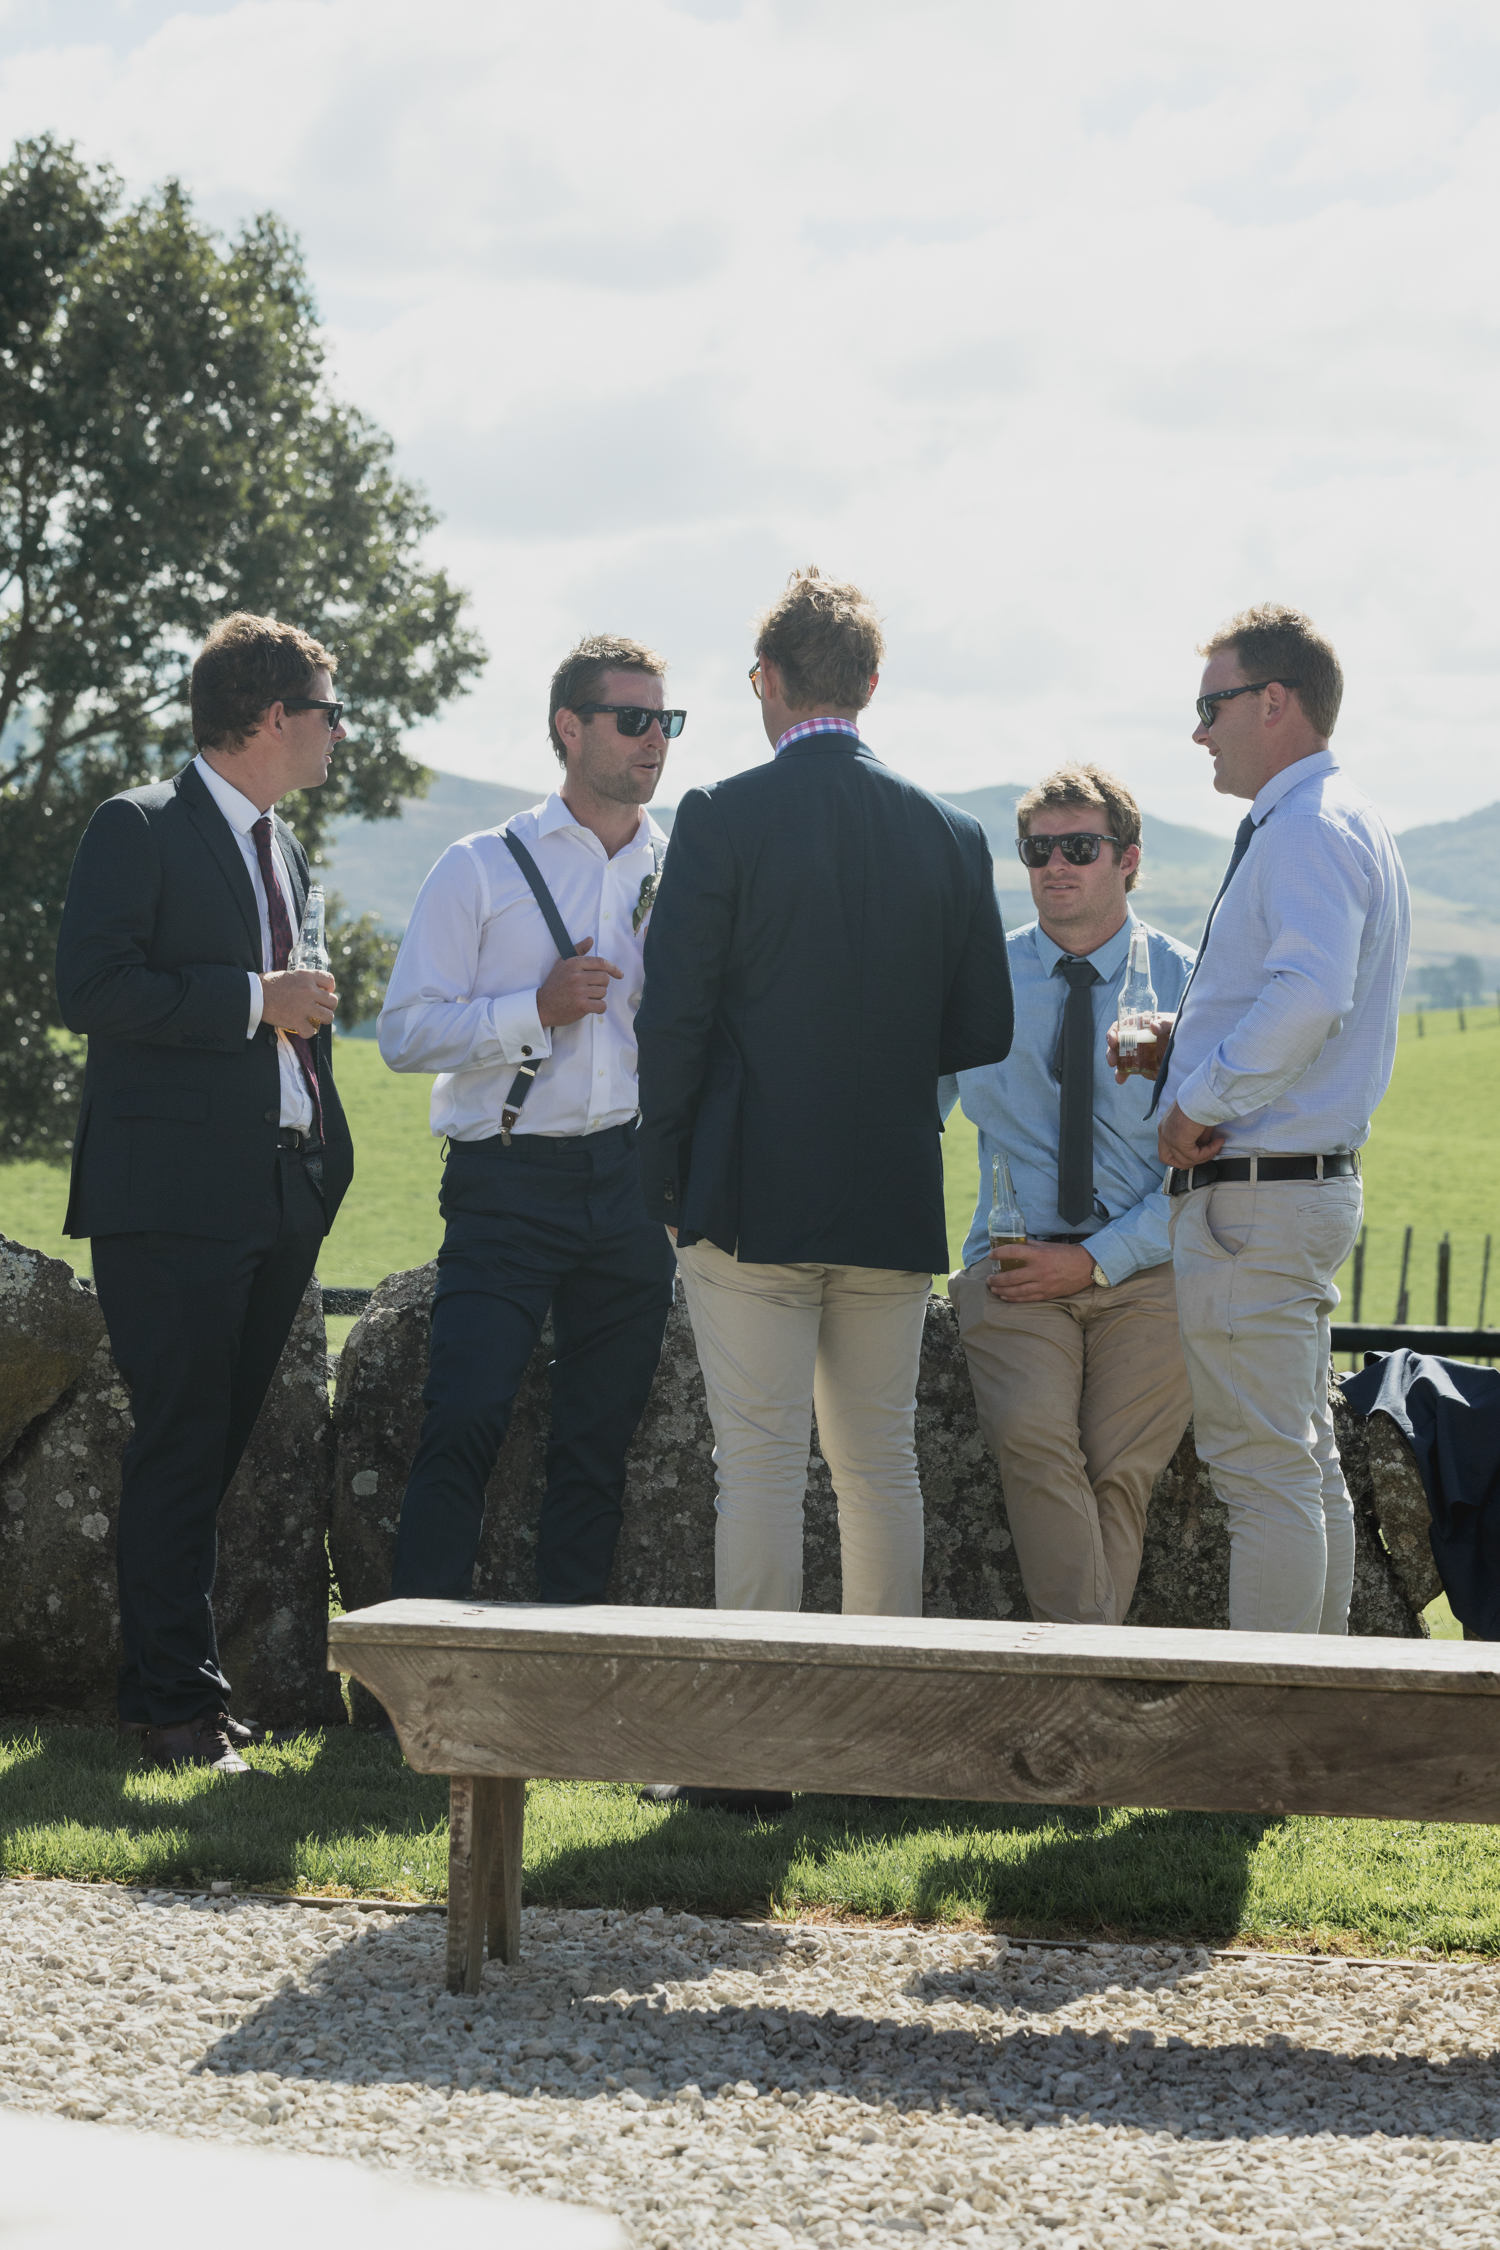 wedding-at-the-red-barn-new-zealand-wedding-photographer-the-boys-yarning.jpg